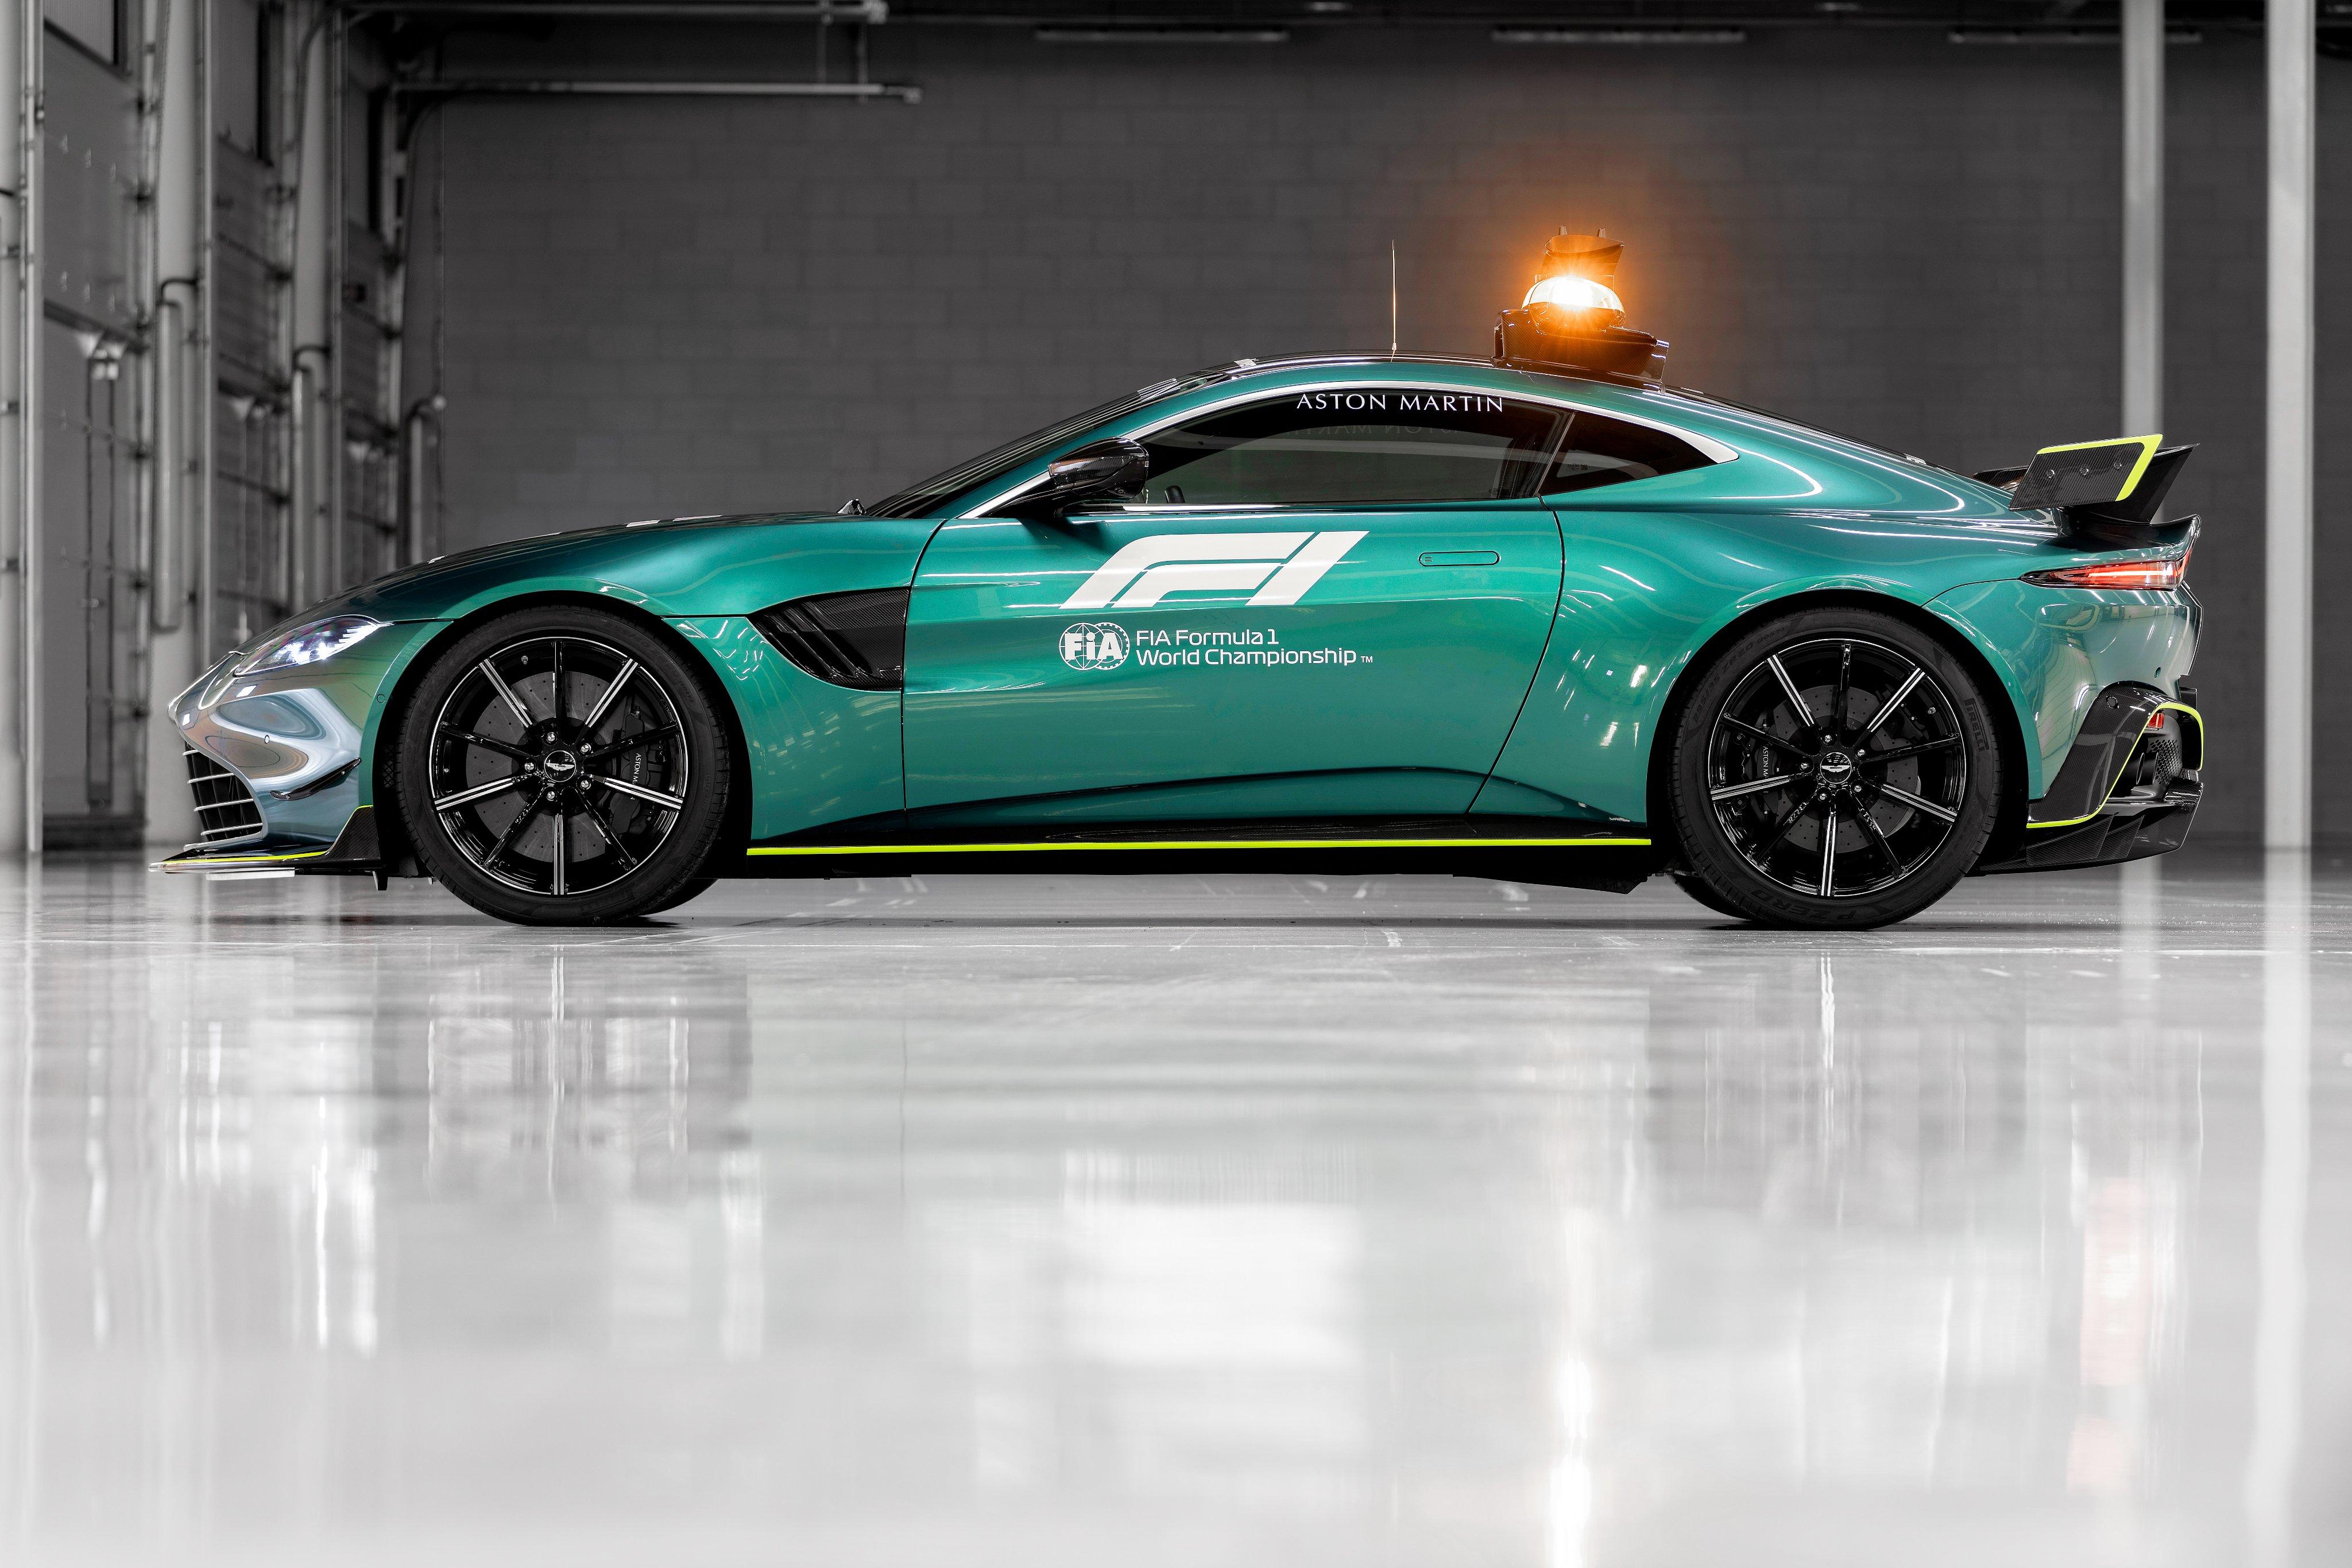 aston-martin-vantage-safety-car-1-soymotor.jpg